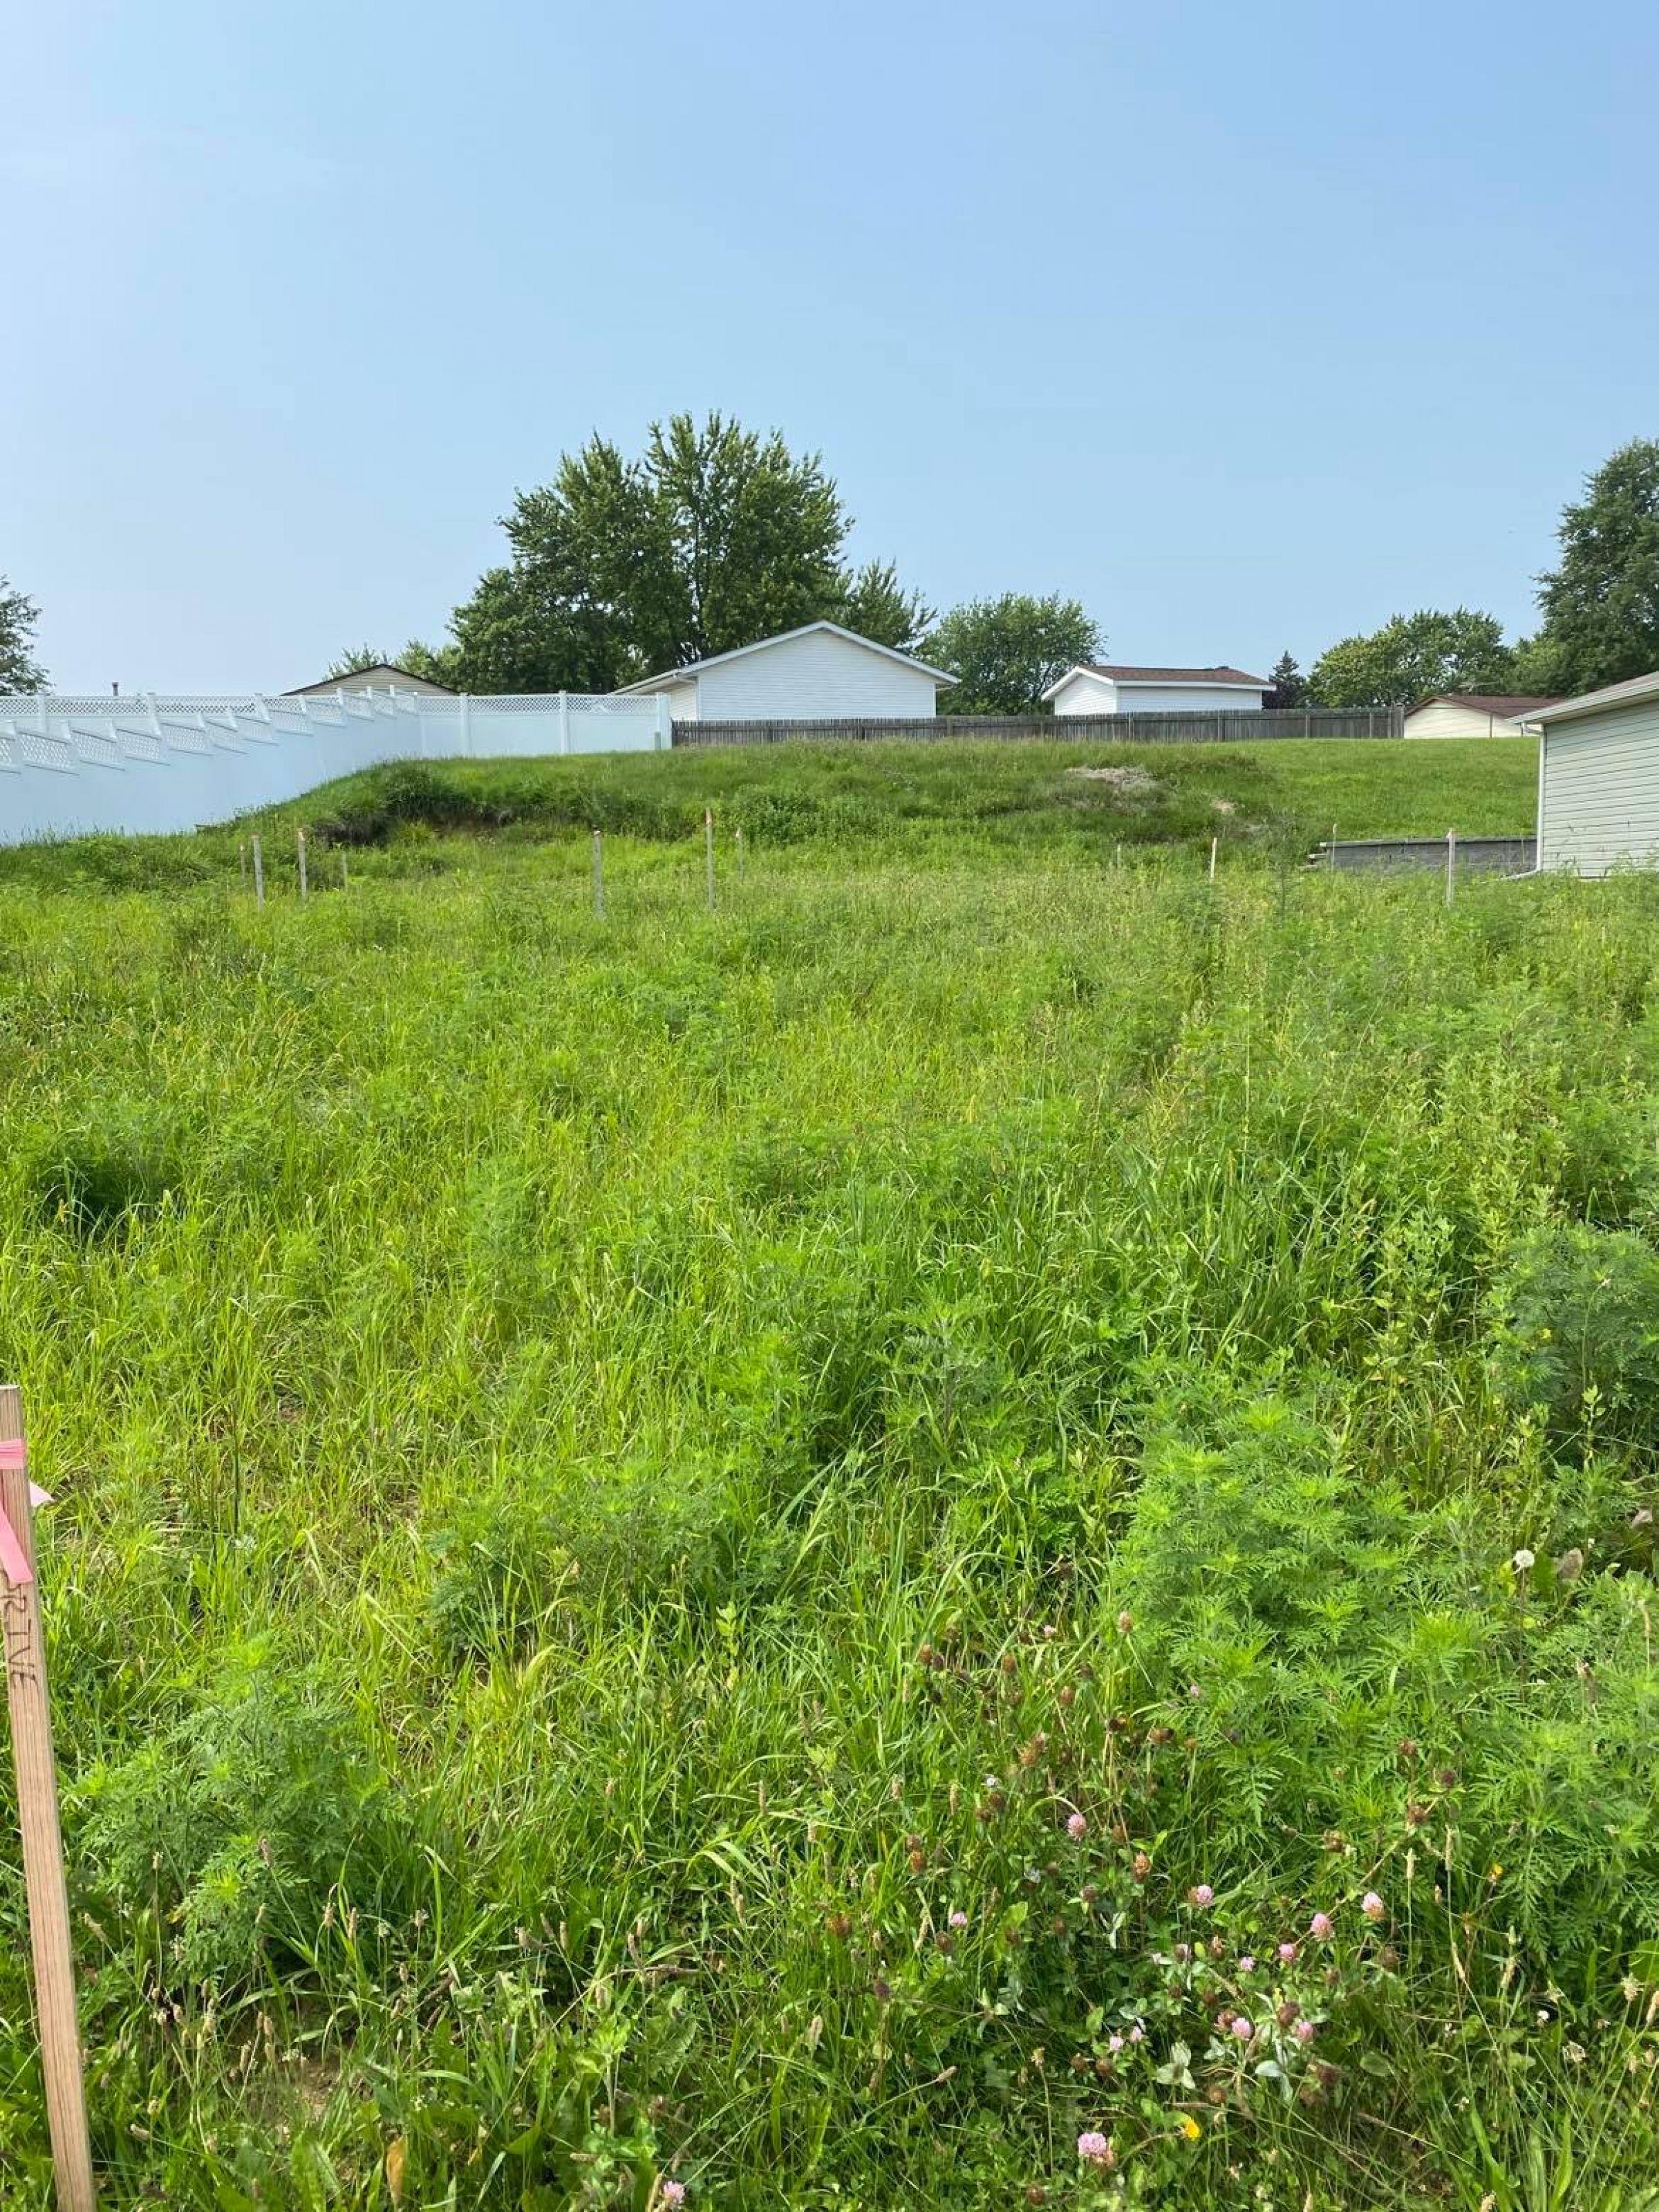 development-land-scott-county-iowa-0-acres-listing-number-15767-1-2021-09-22-040112.jpg